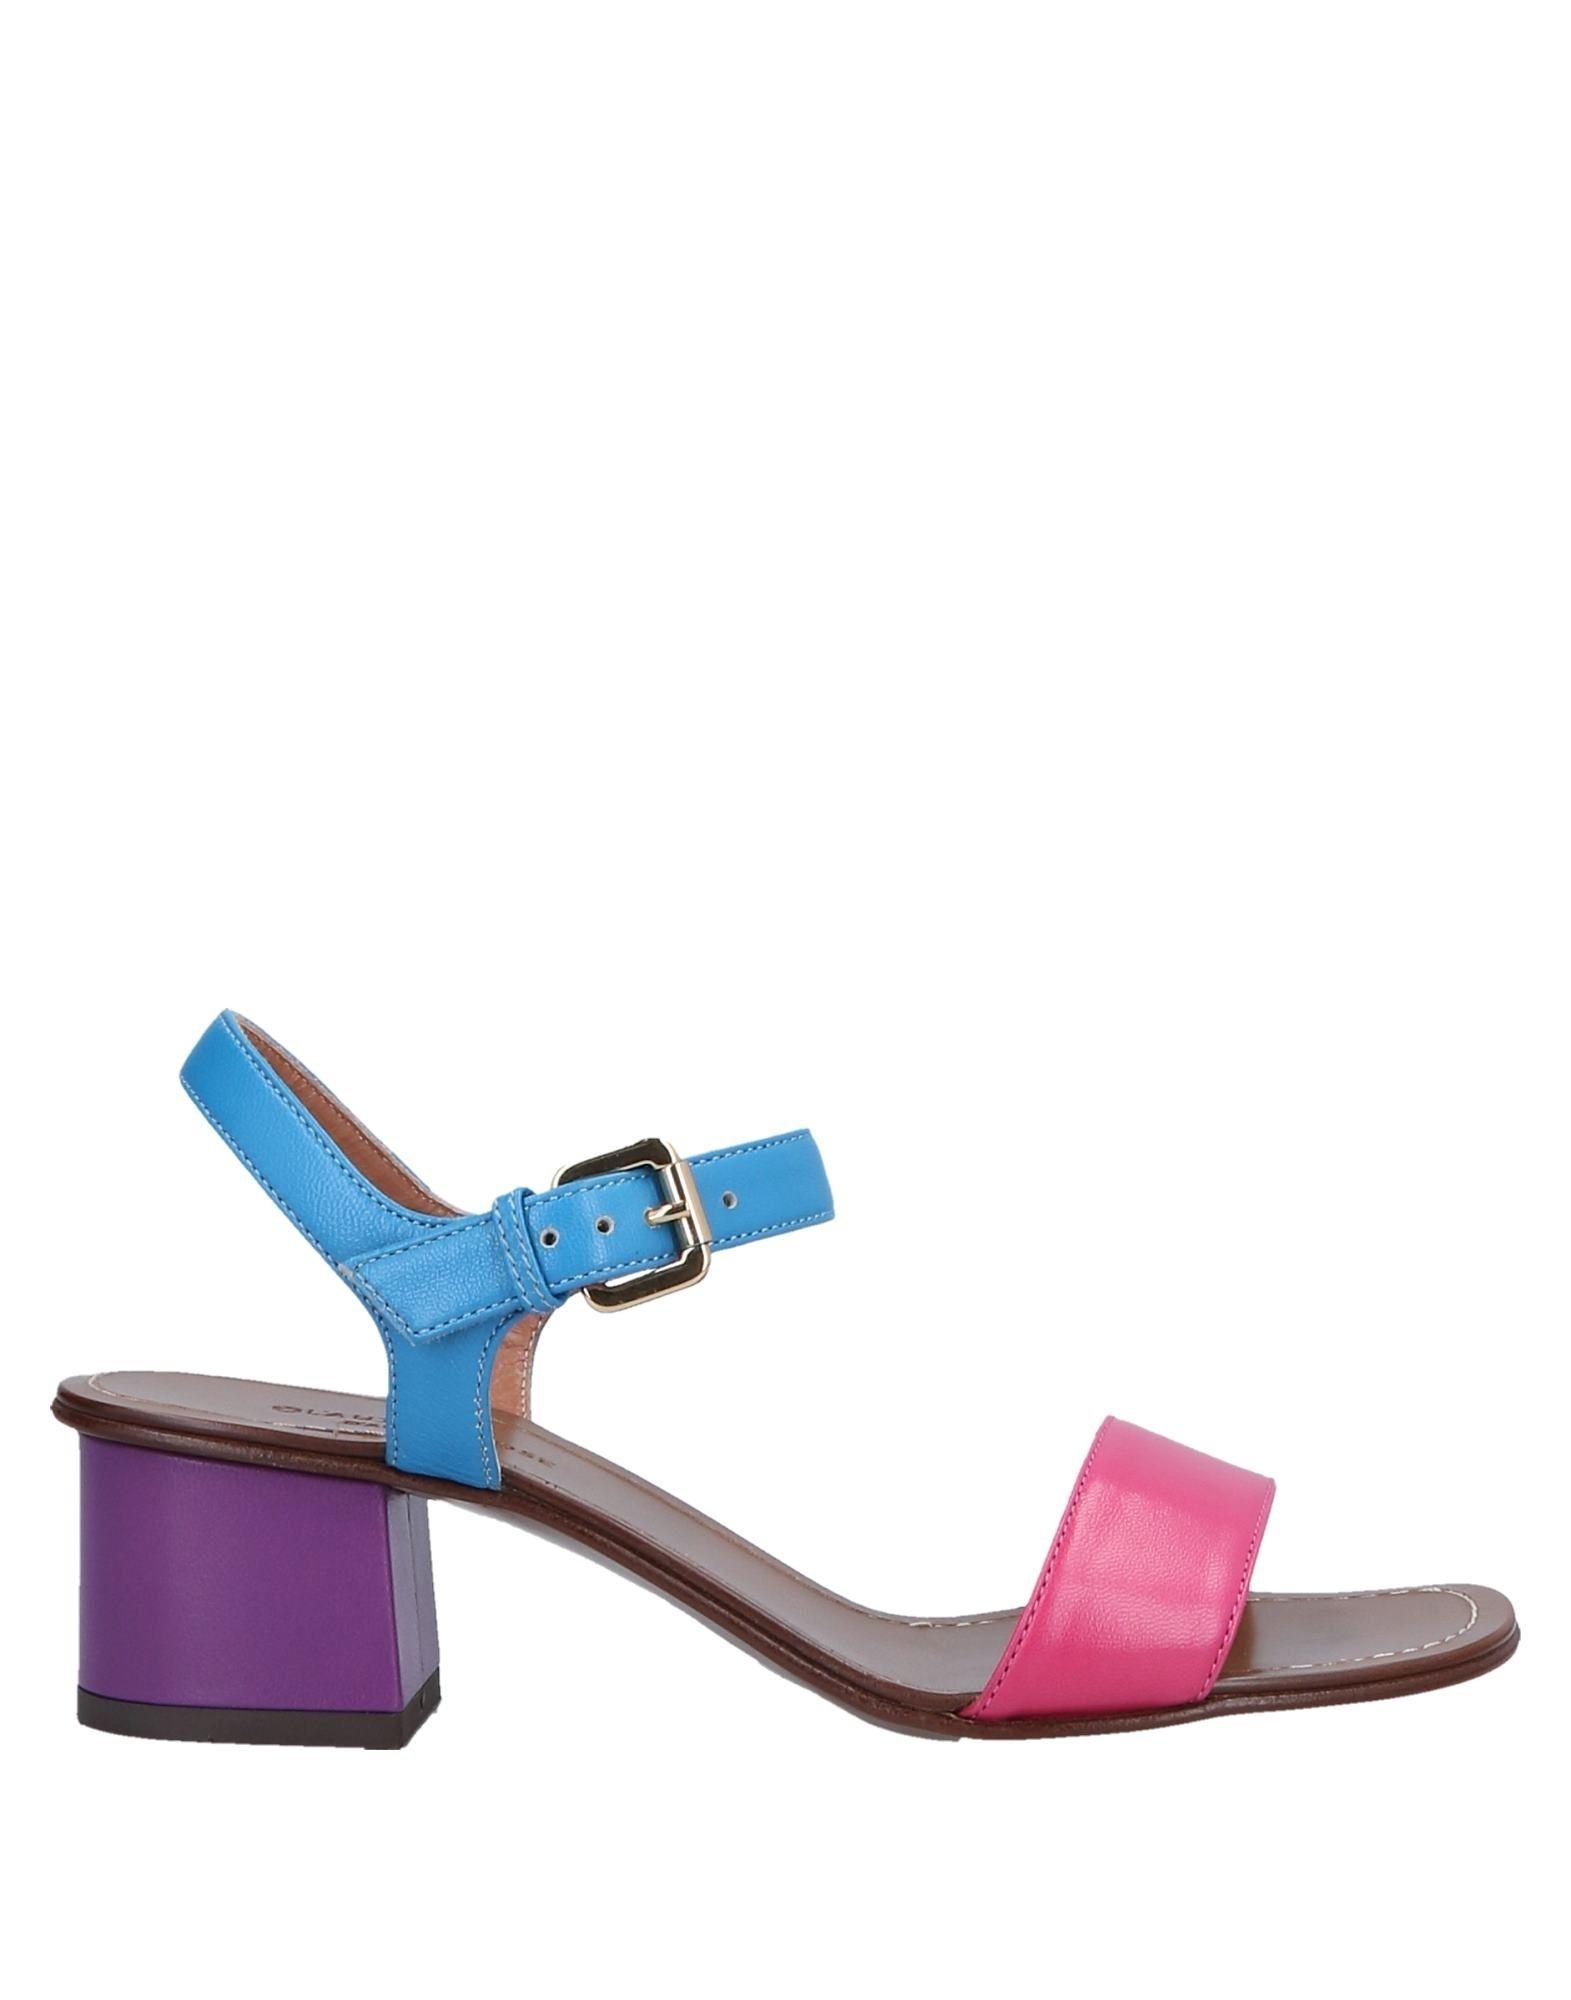 L' Autre Chose Sandalen Damen Schuhe  11303102FTGut aussehende strapazierfähige Schuhe Damen 5cdbbd